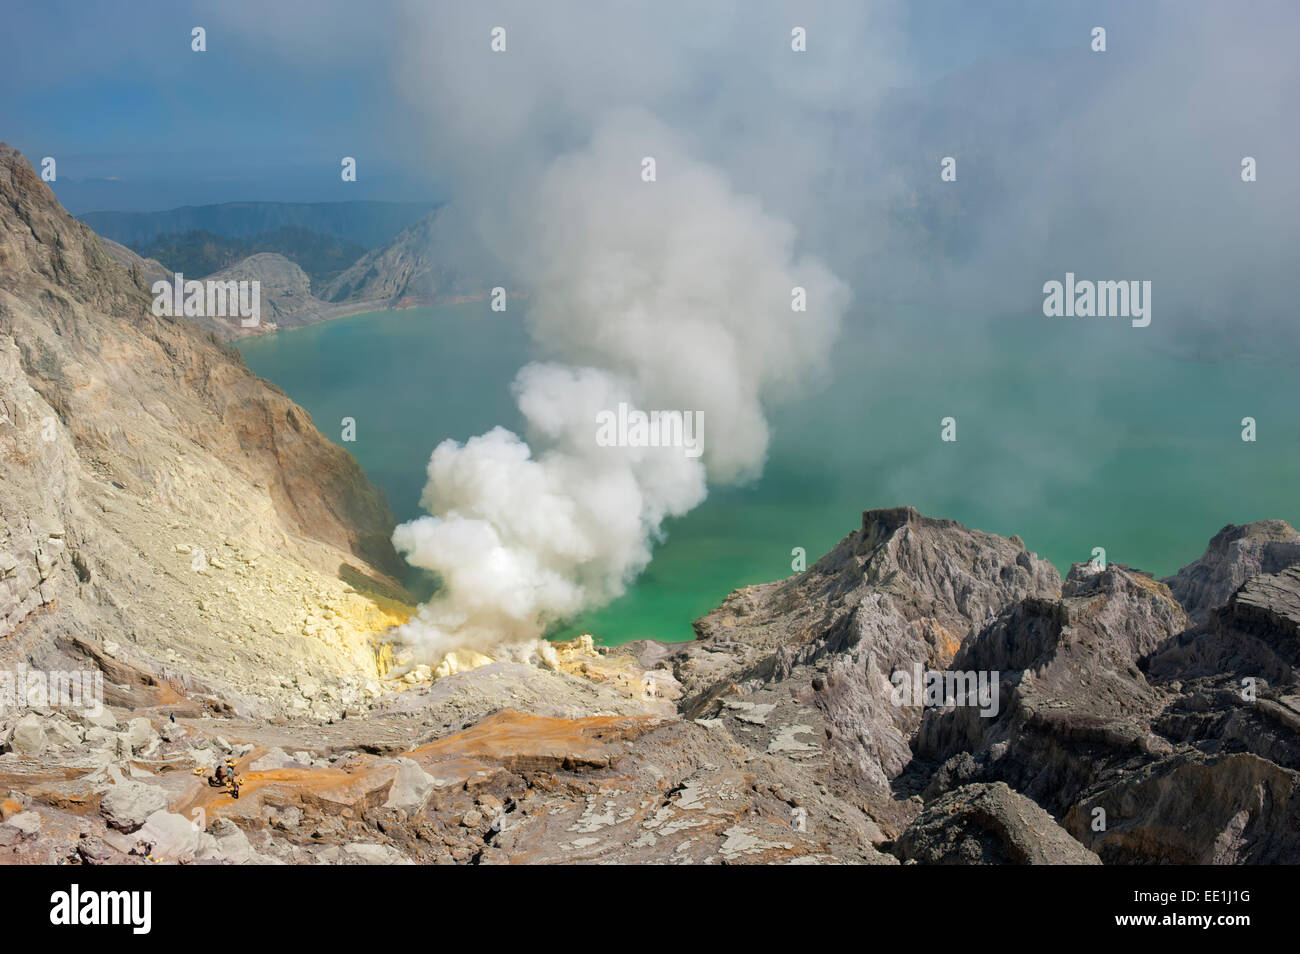 Kawah Ijen volcano (Ijen crater and lake), Banyuwangi, East Java, Indonesia, Southeast Asia, Asia - Stock Image